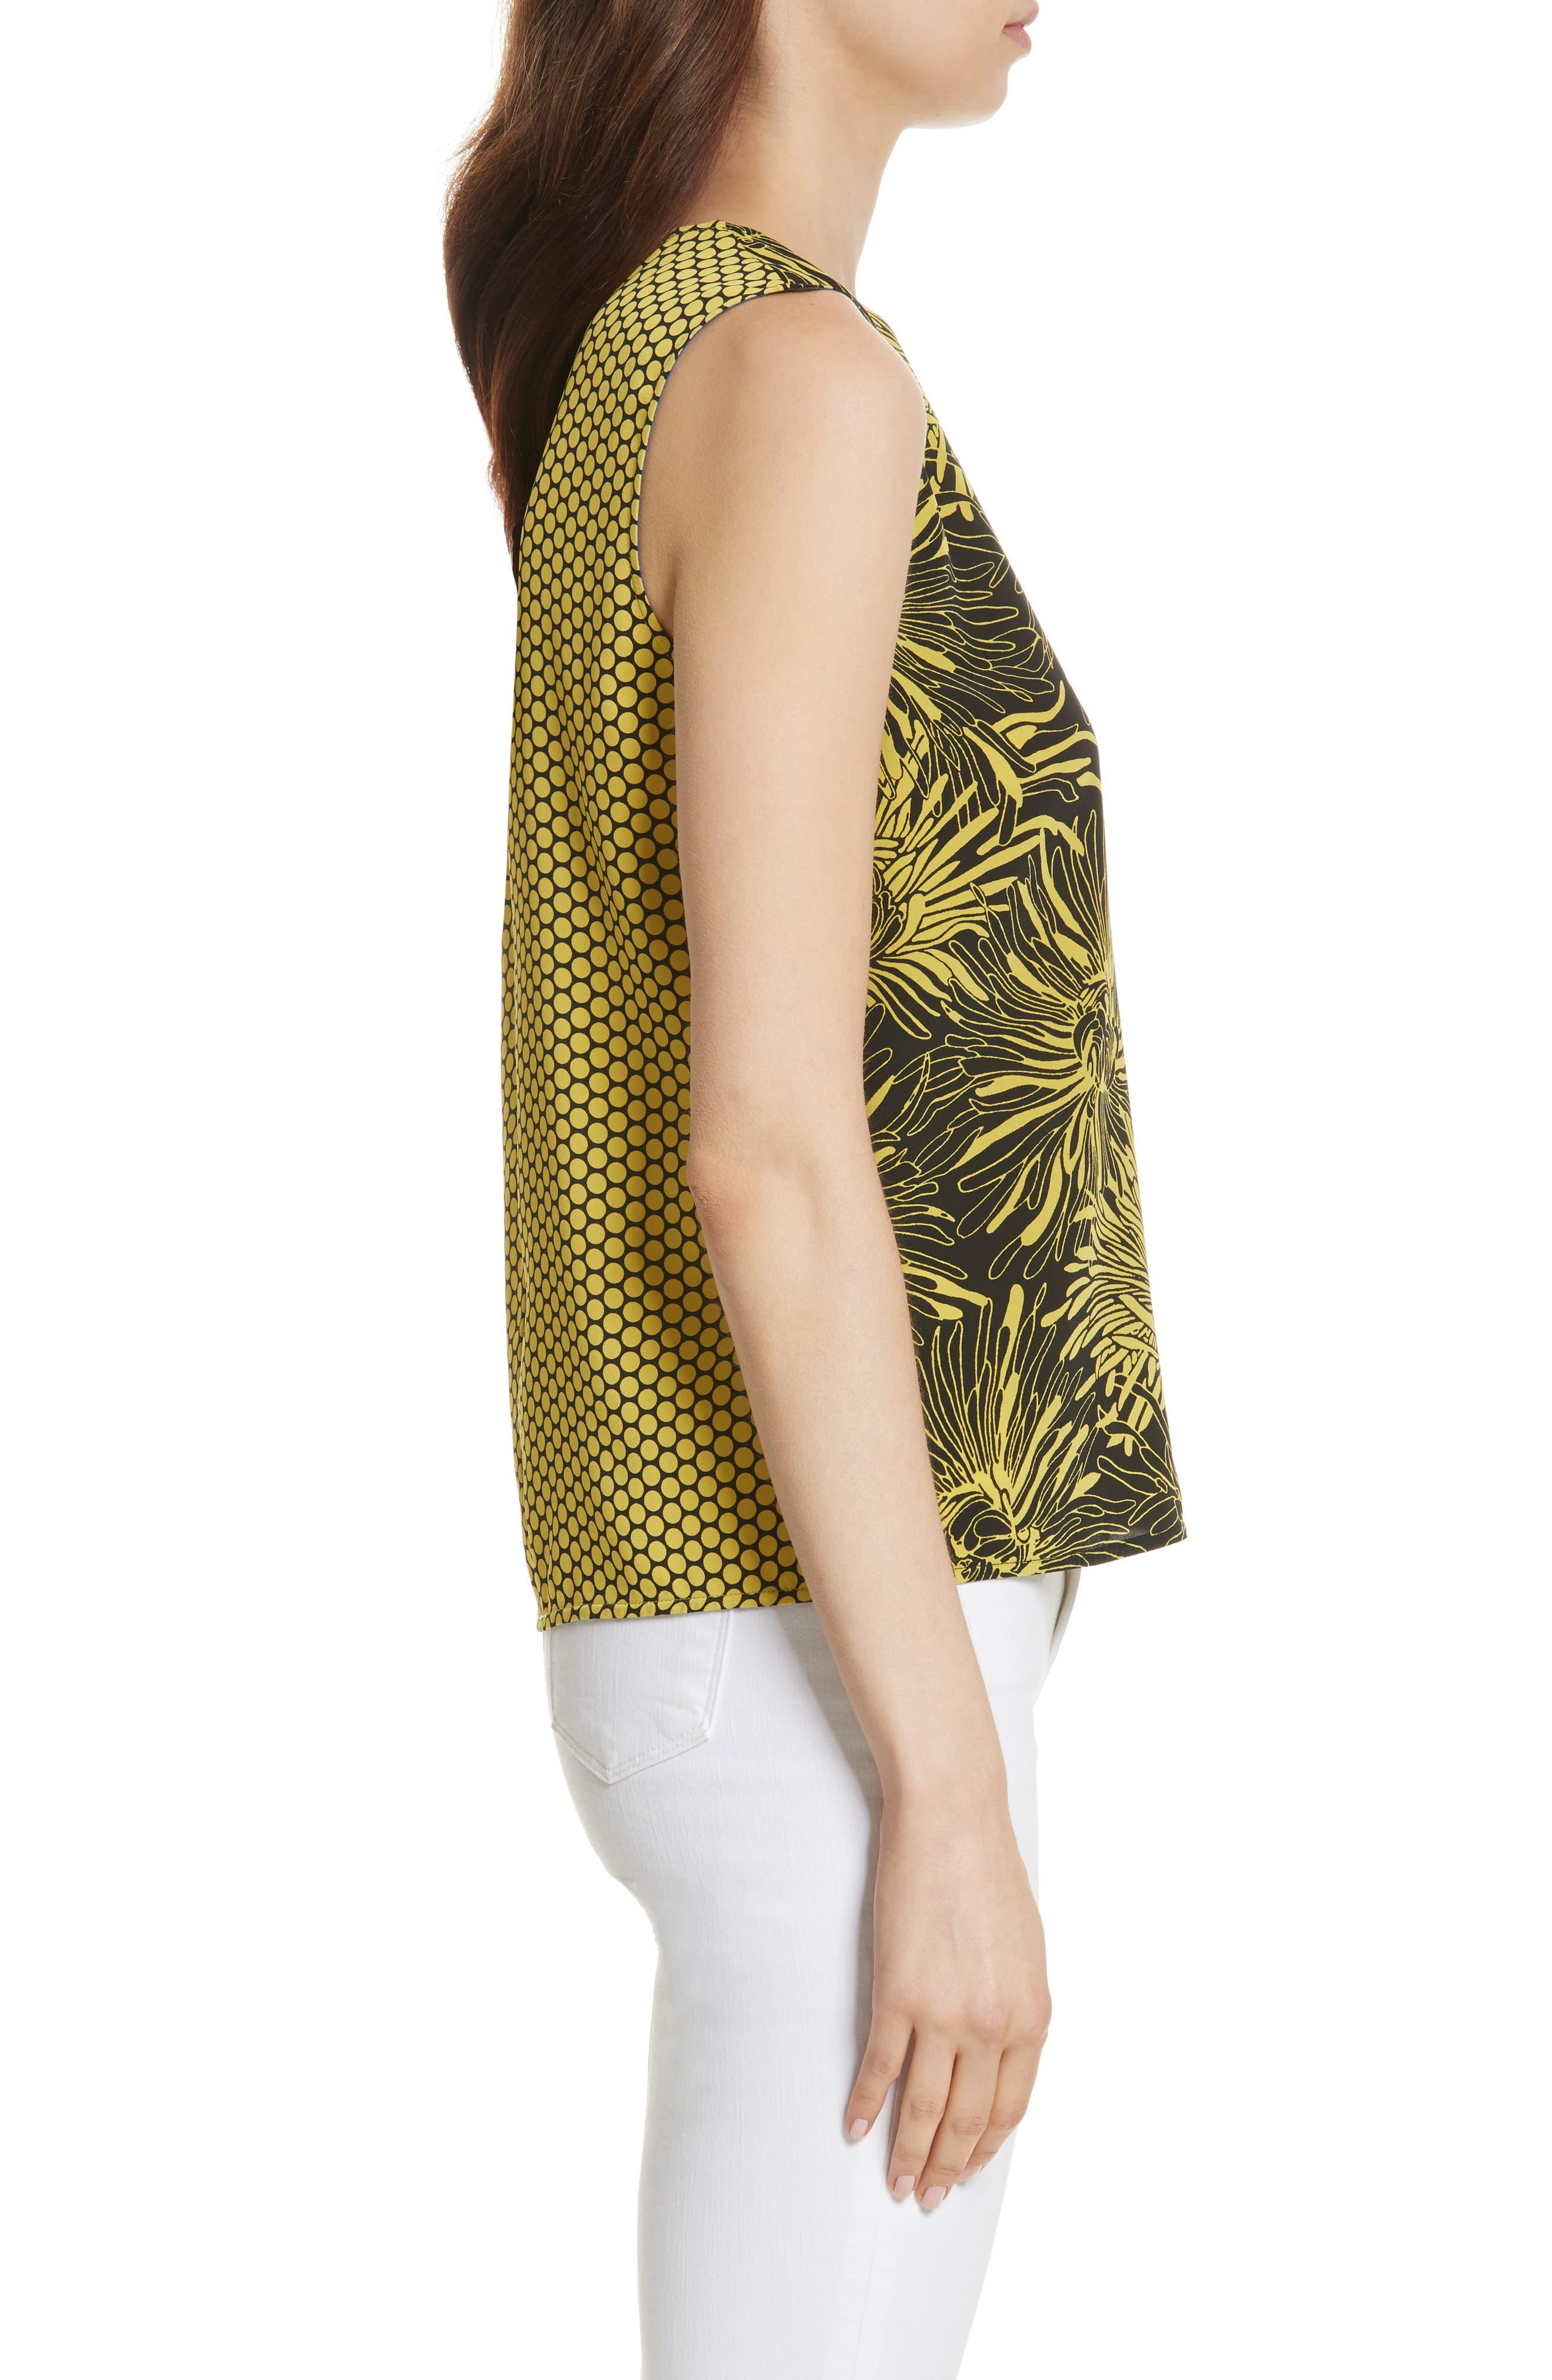 Diane von Furstenberg Floral Print Silk Shell,                             Alternate thumbnail 3, color,                             Worsley Citron/ Rowe Dot